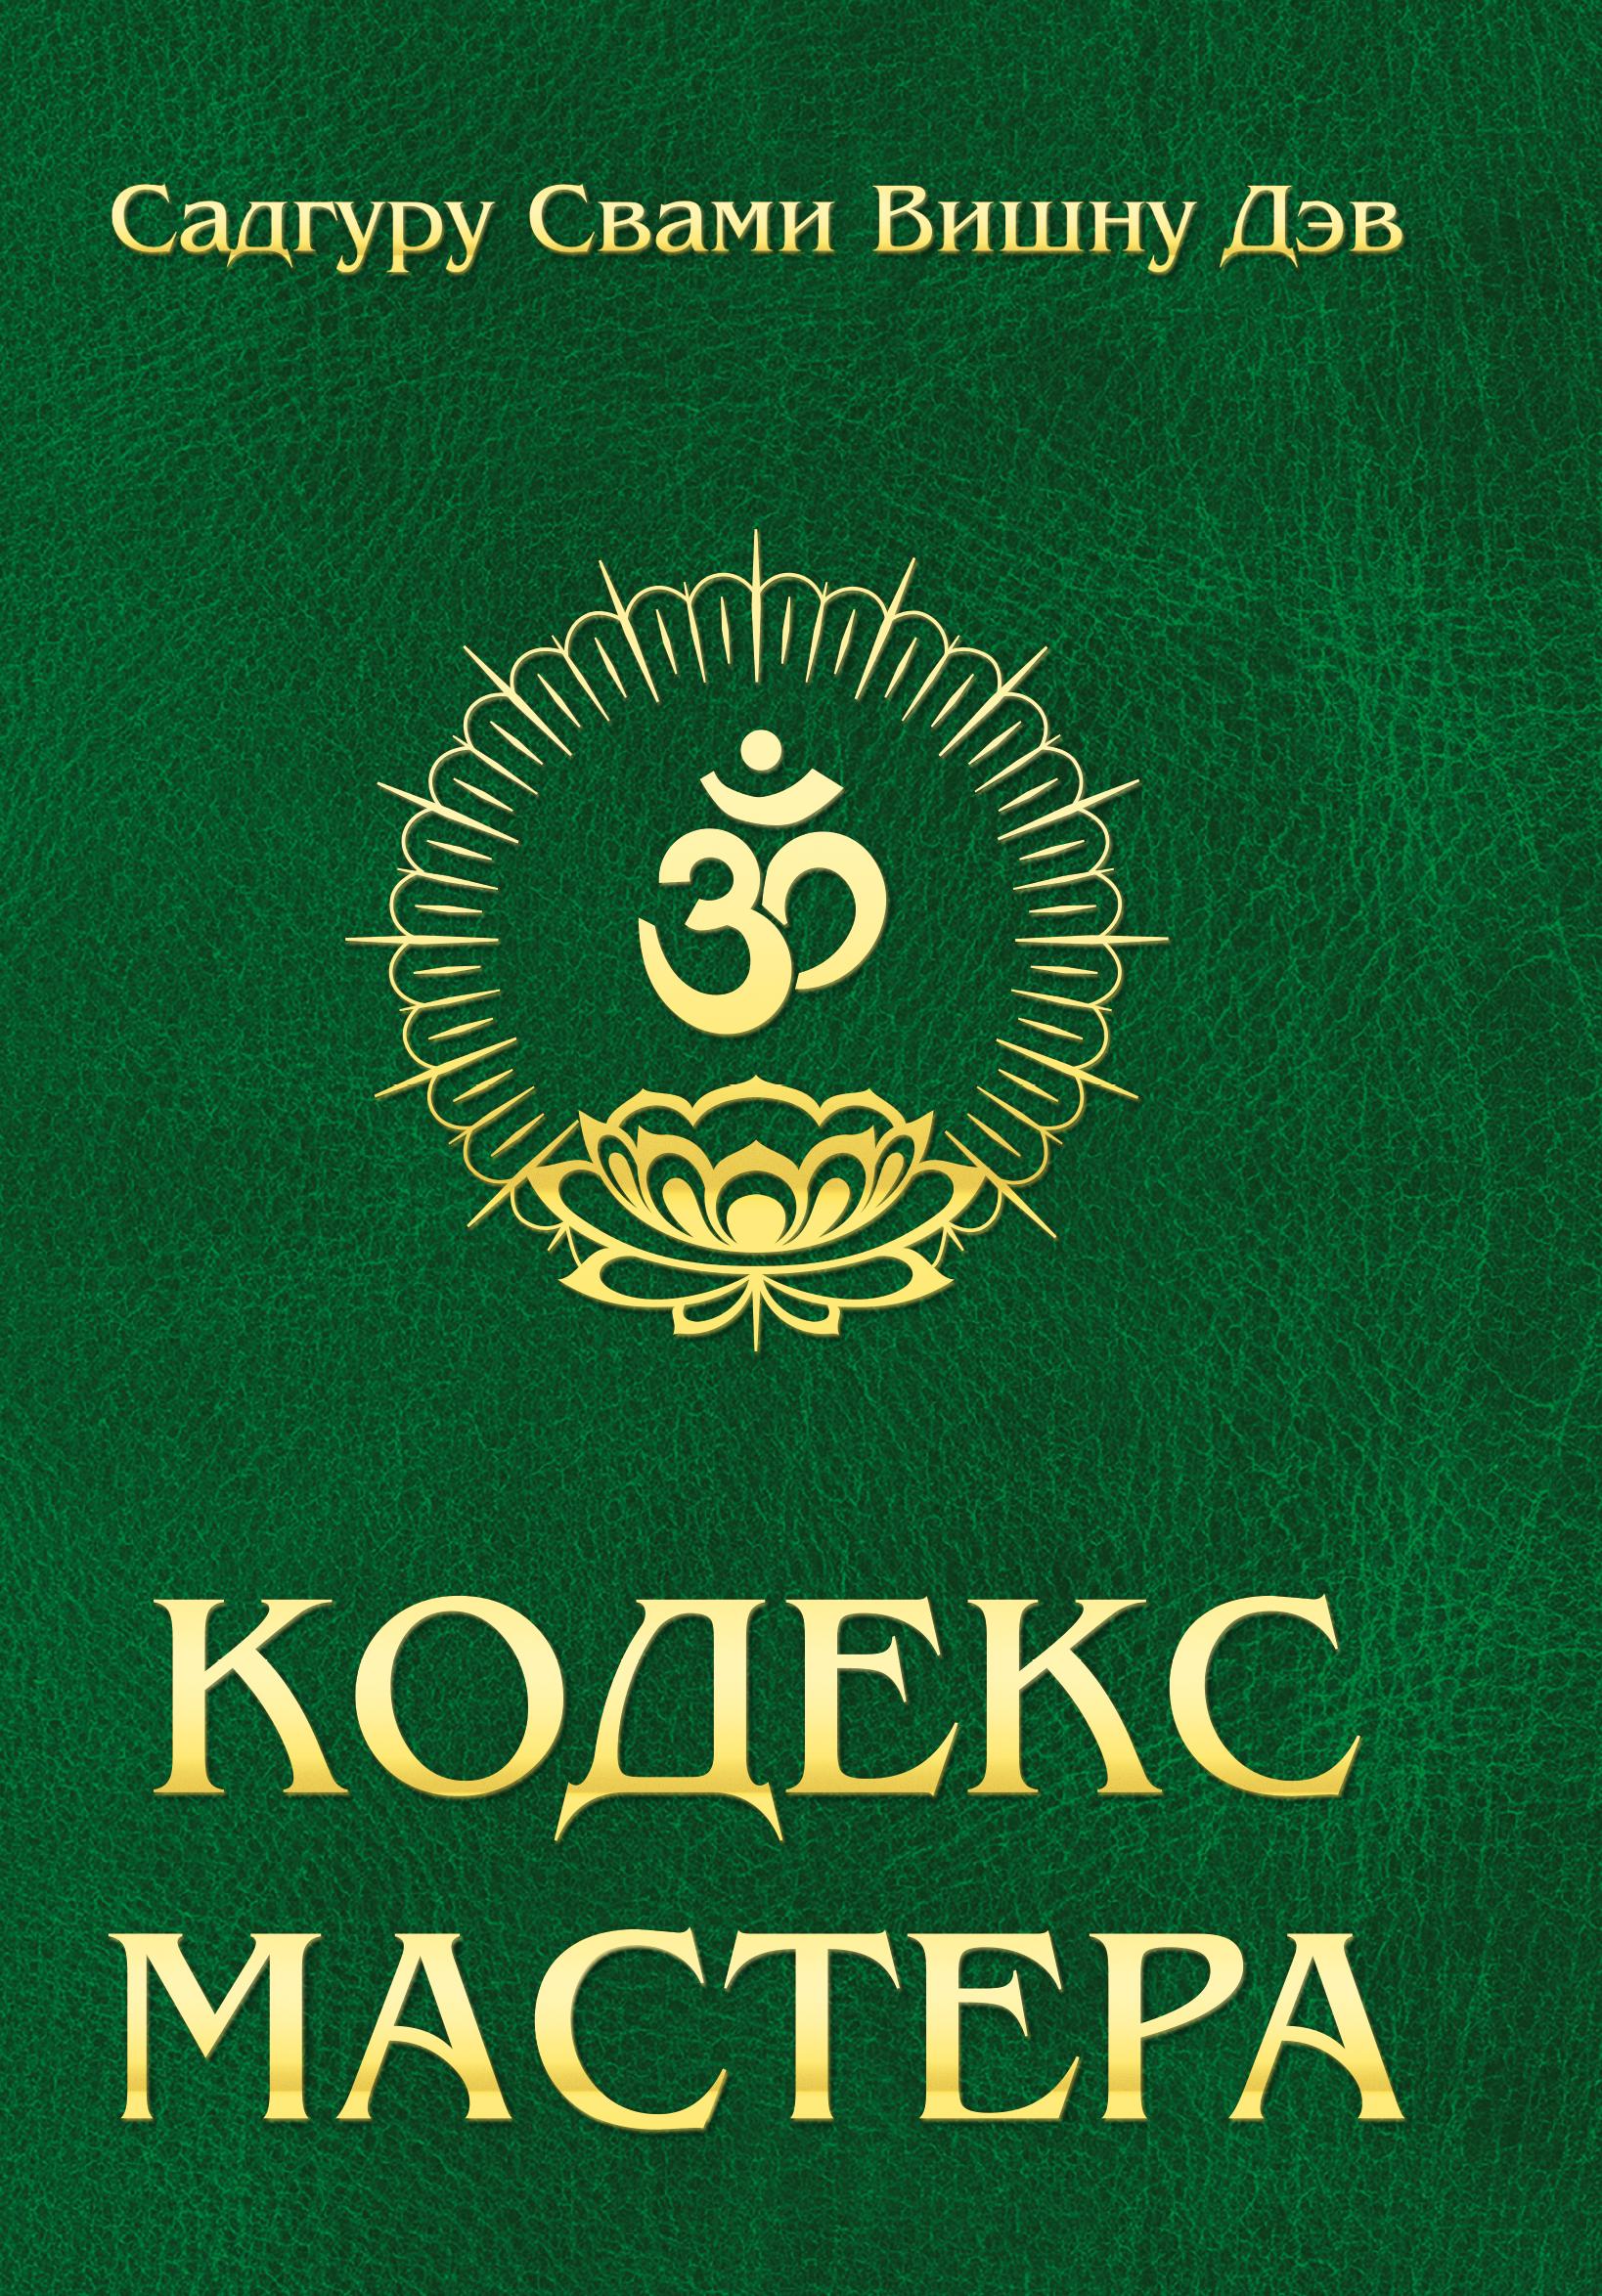 Кодекс Мастера. 2-е изд. (обл.) Руководство по практике йоги